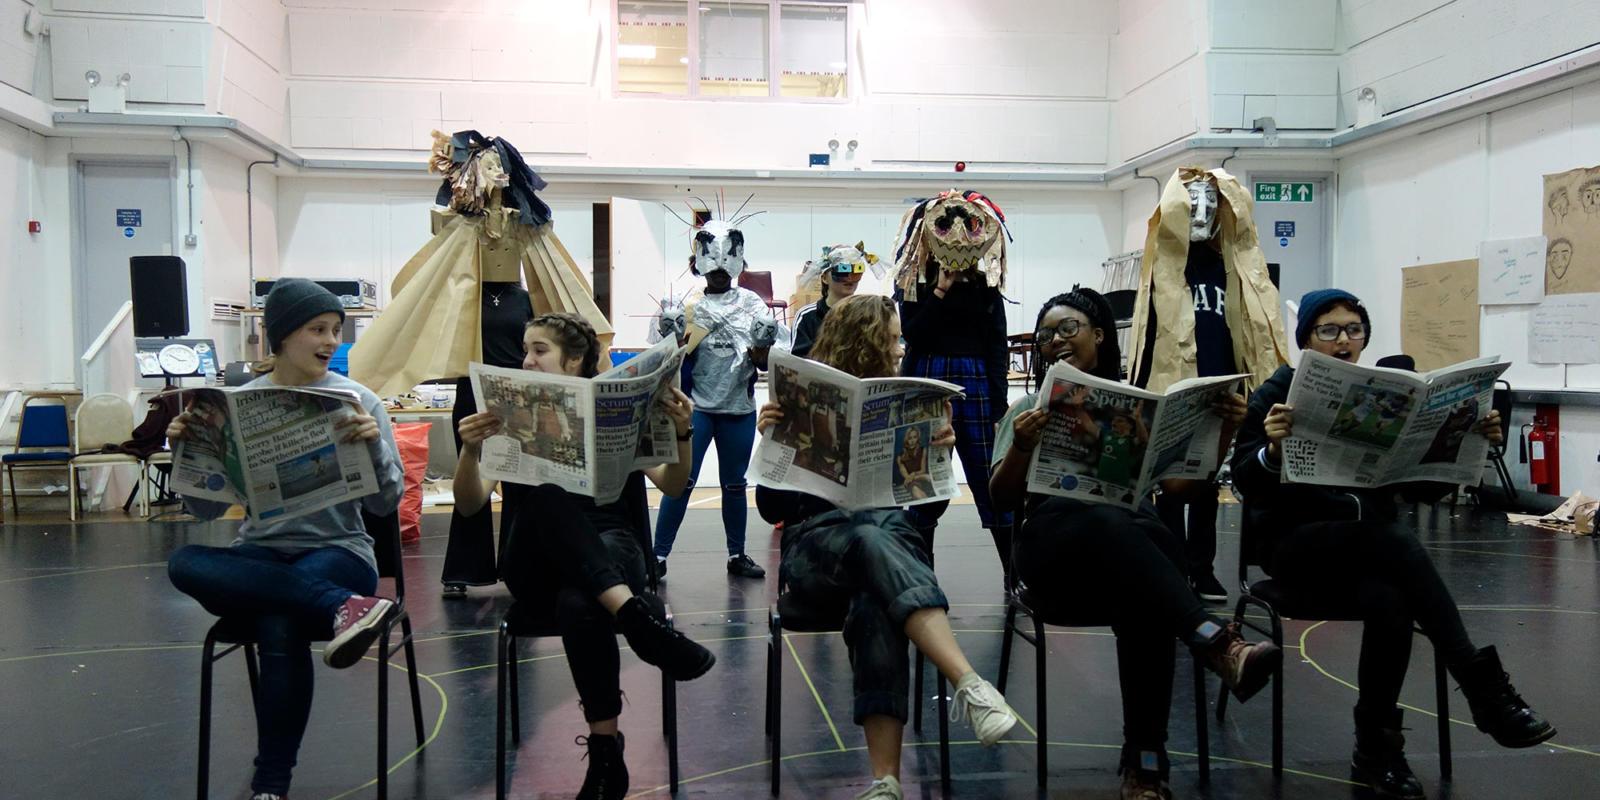 ENO Youth Company 2017/18 - sharing performance inspired by Philip Glass' opera Satyagraha